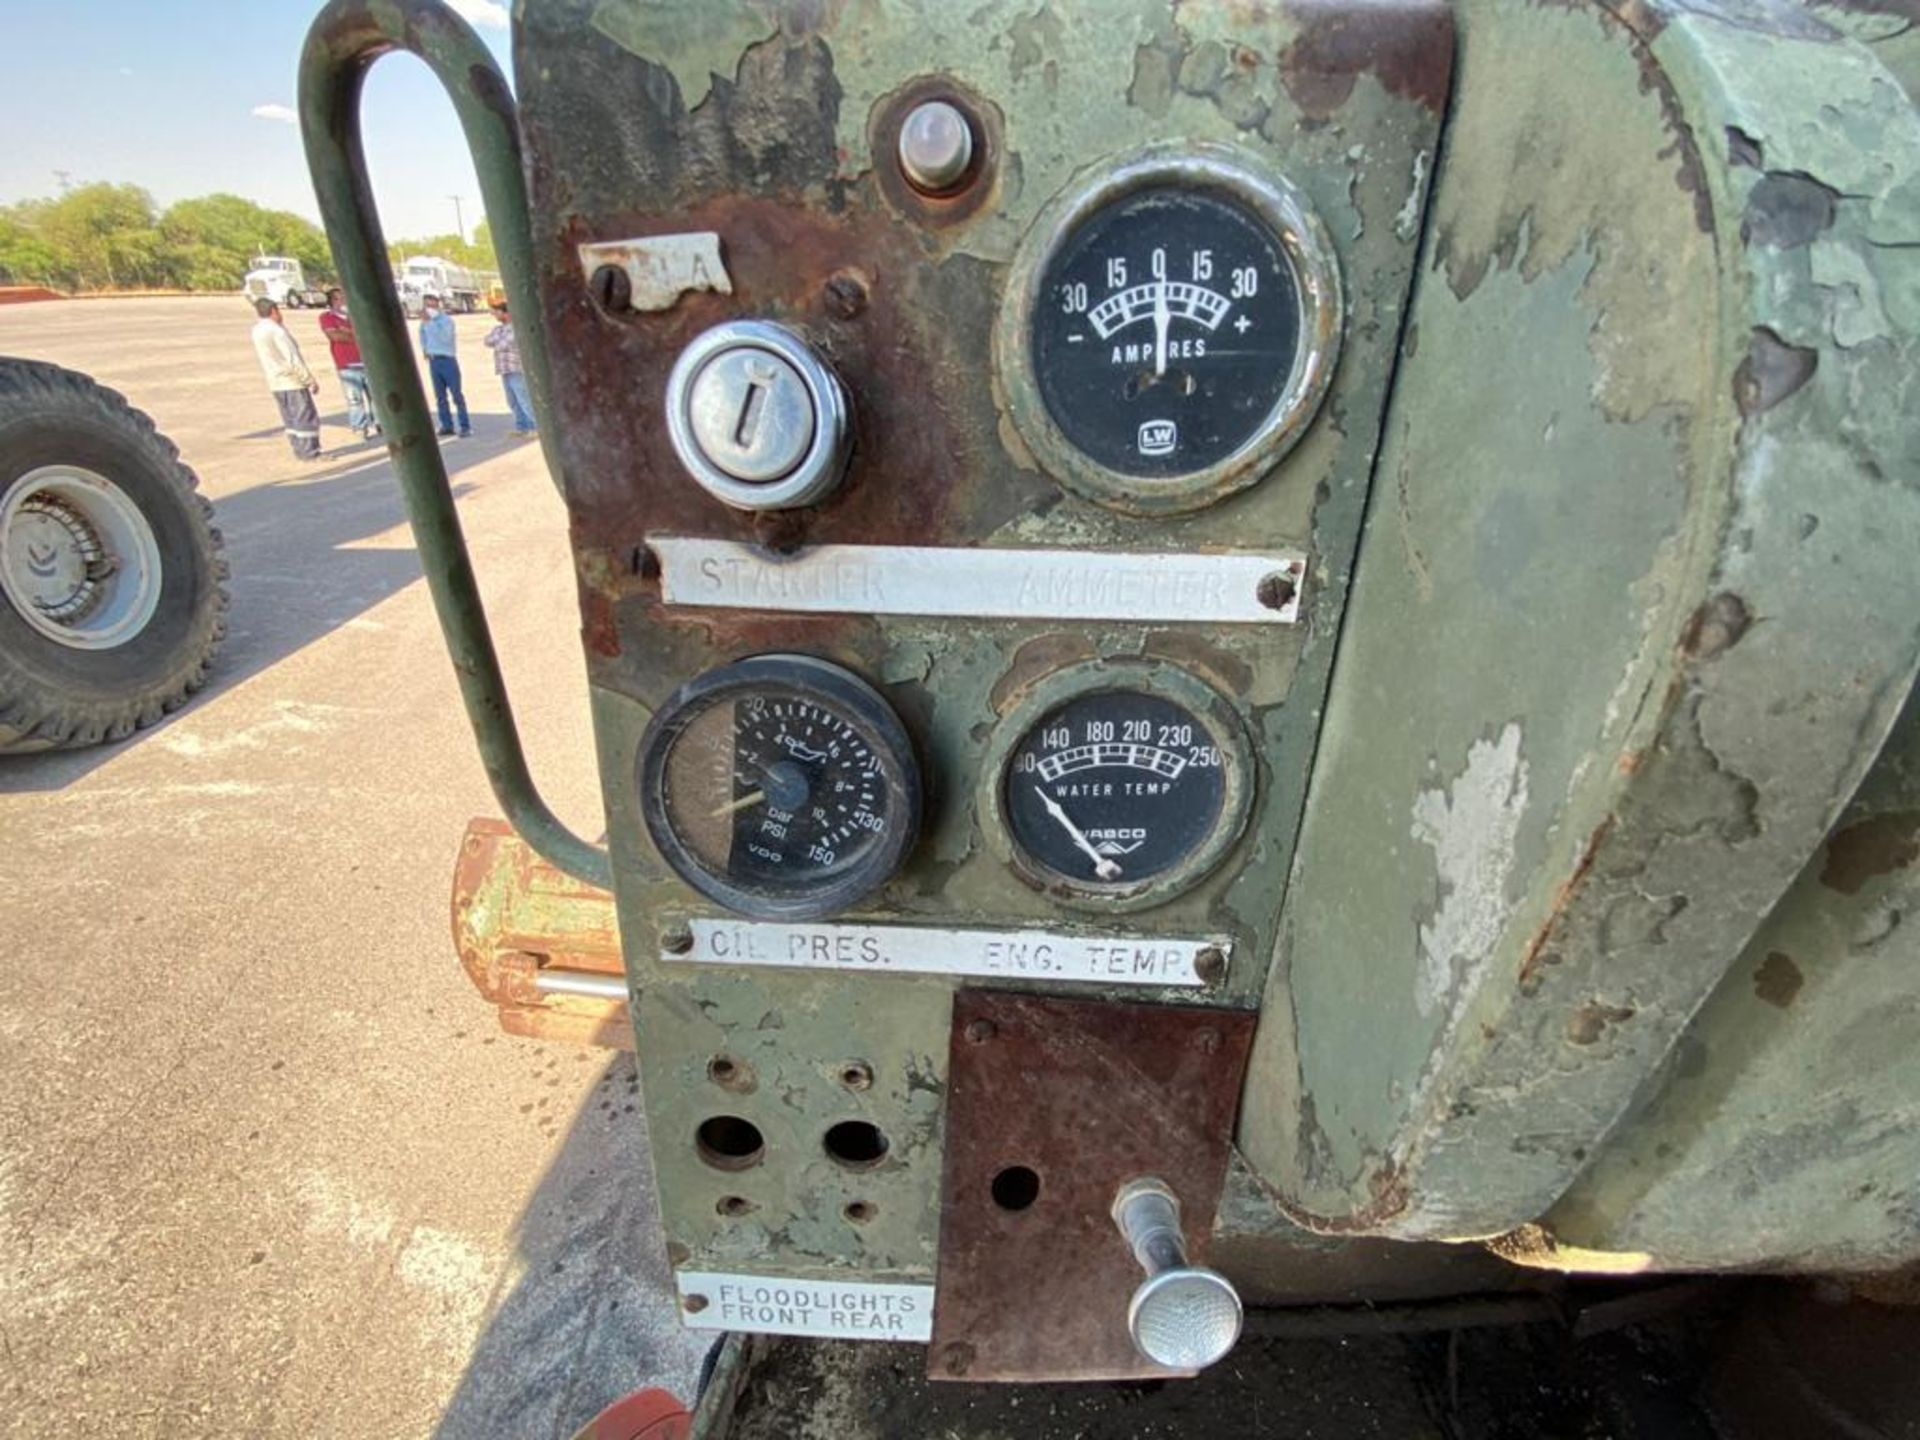 1970 Wabco4 440H Motor Grader, Serial number 440HAGM1398 - Image 44 of 77